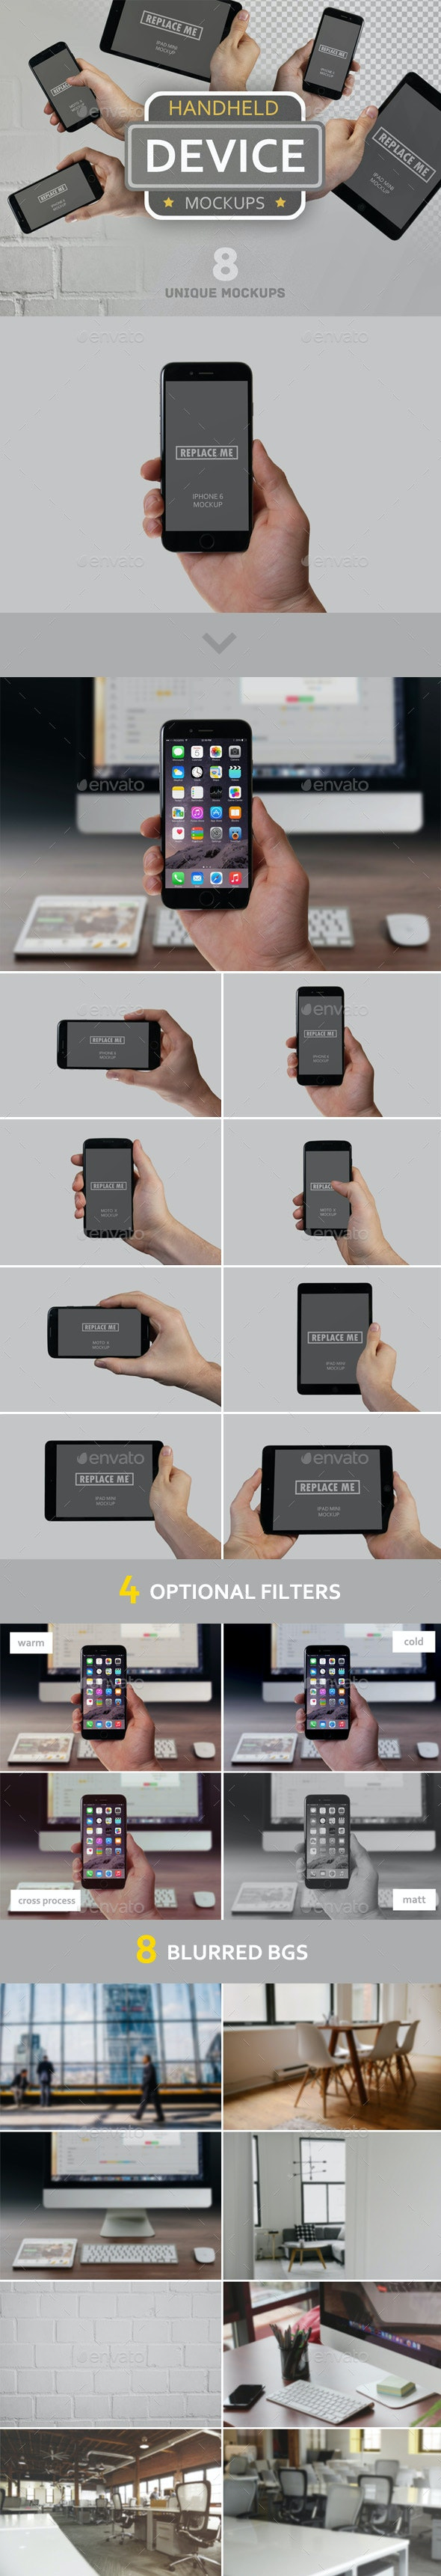 Handheld Device Mockups - Mobile Displays